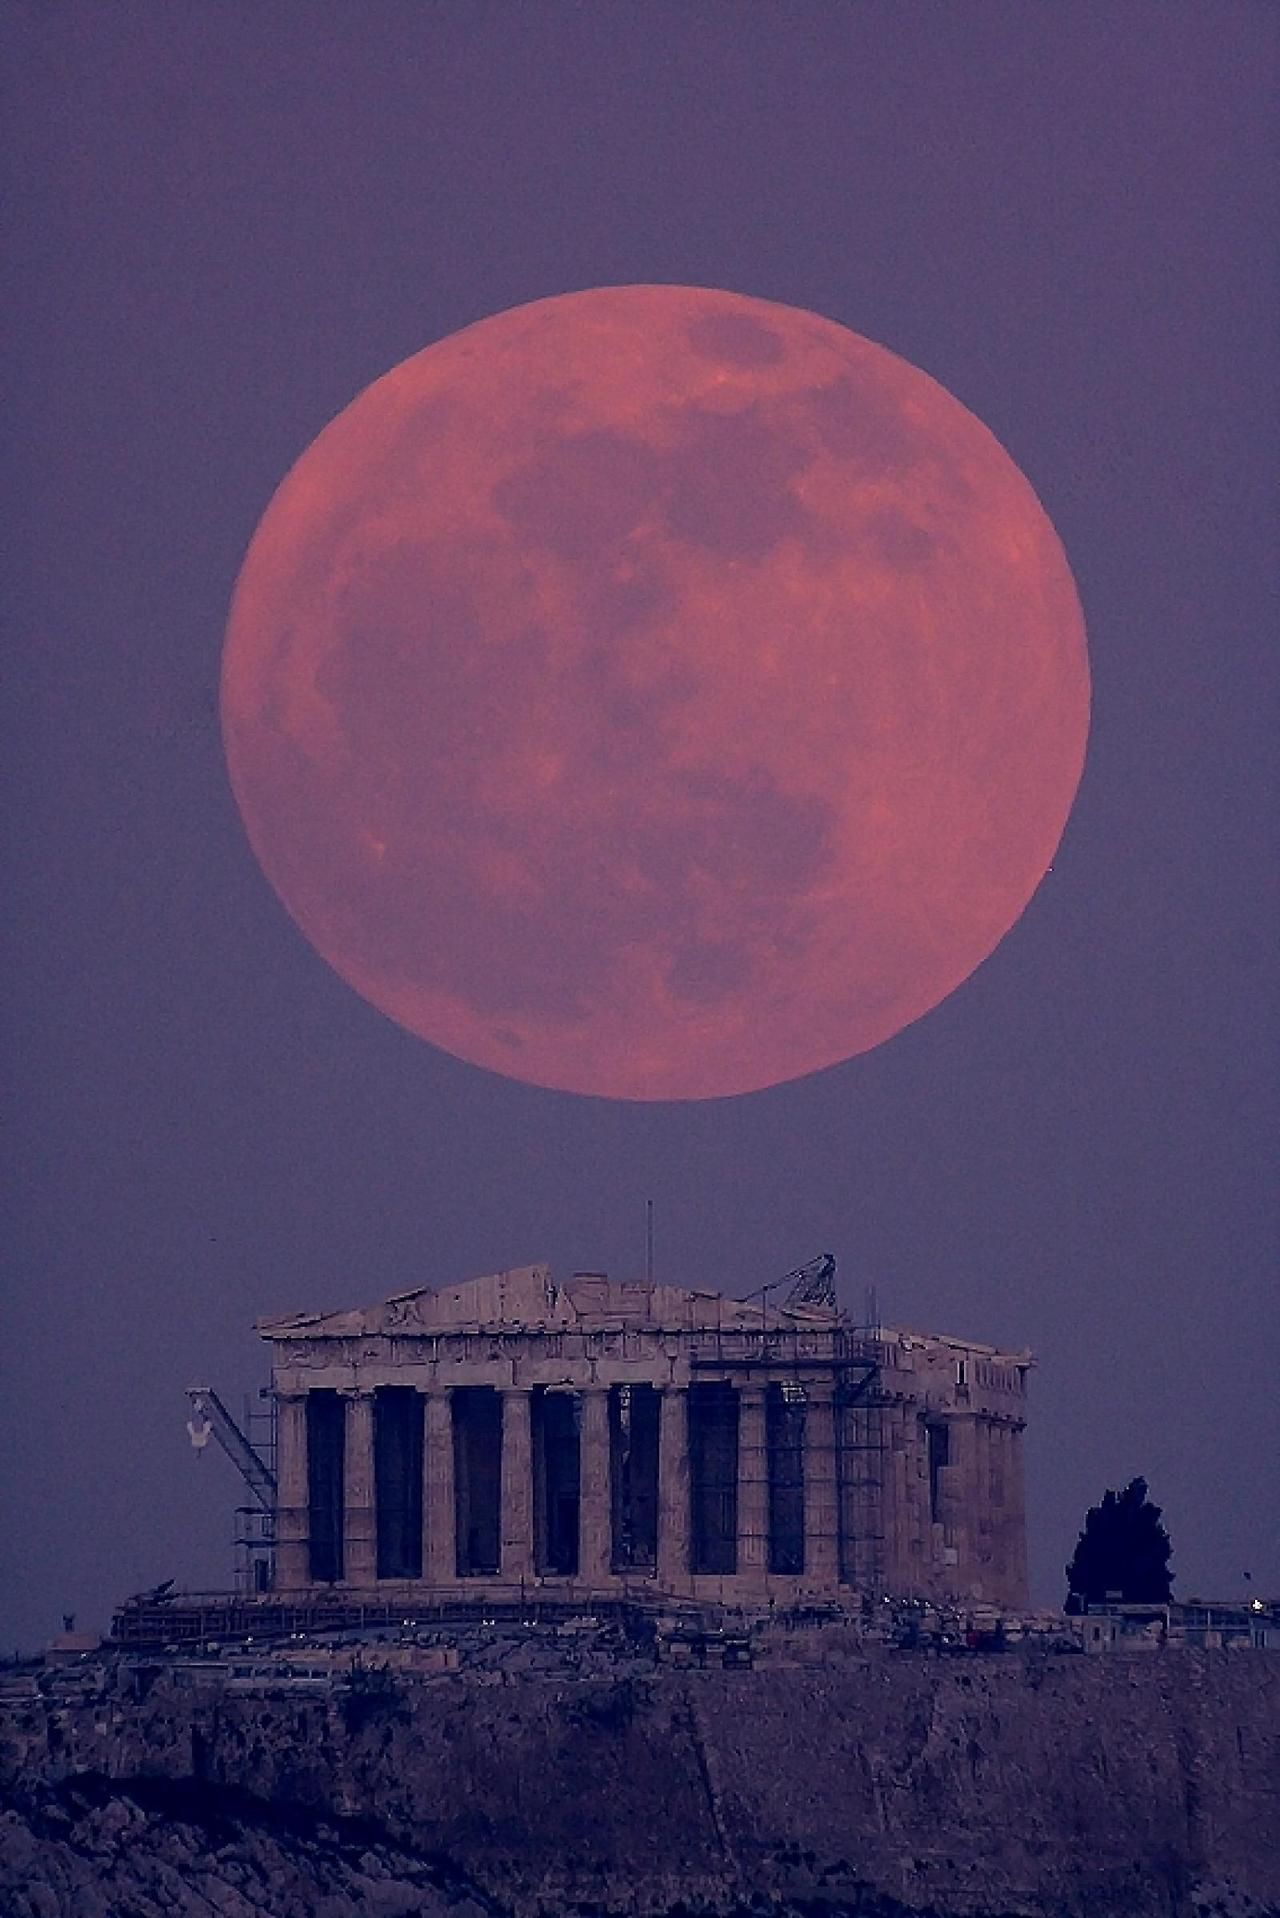 ☆ Parthenon | Athens | GREECE ☆ #Parthenon #Athens #Greece #Moon #Europe